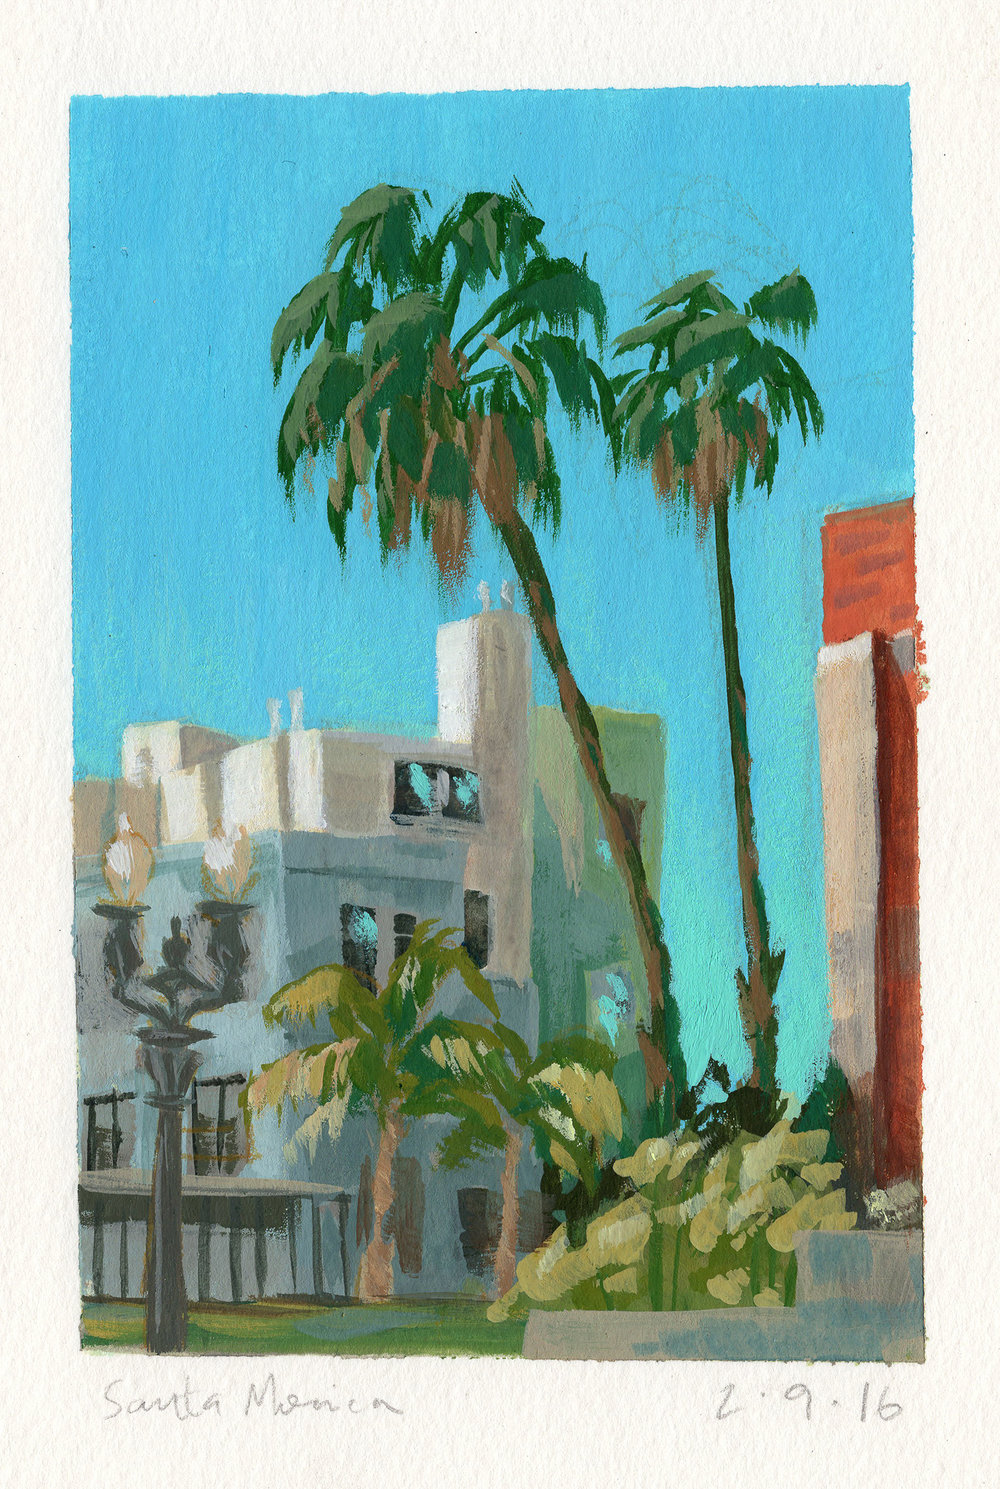 Santa Monica Street_4x6.jpg